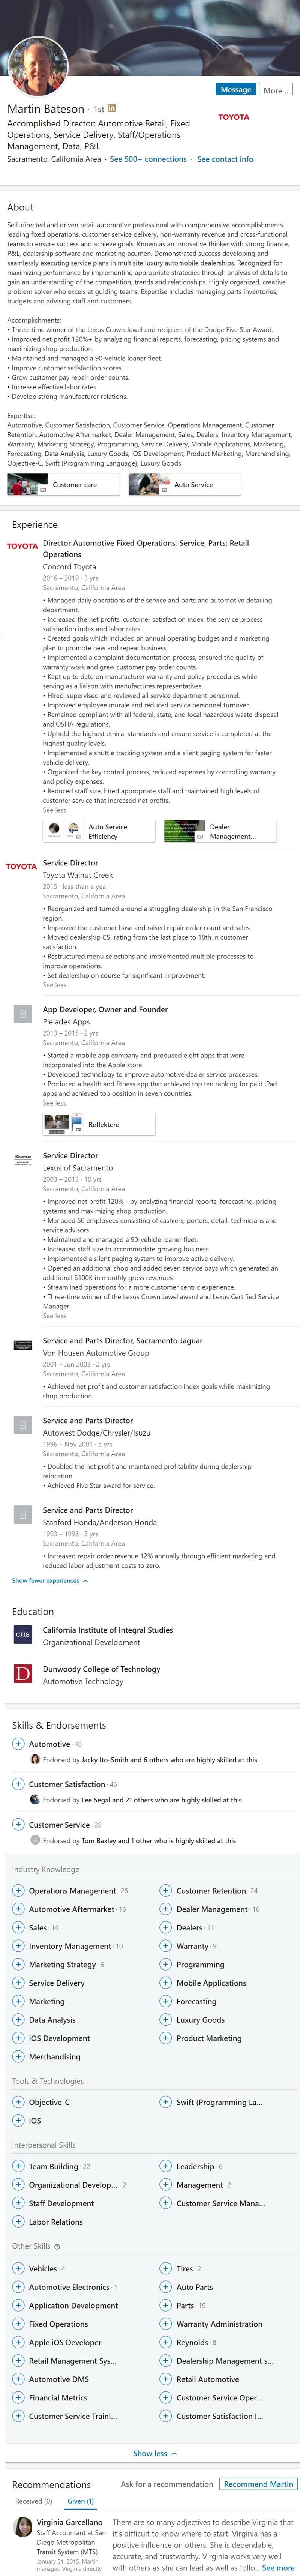 Linkedin Profile example automotive service maintenance 2510